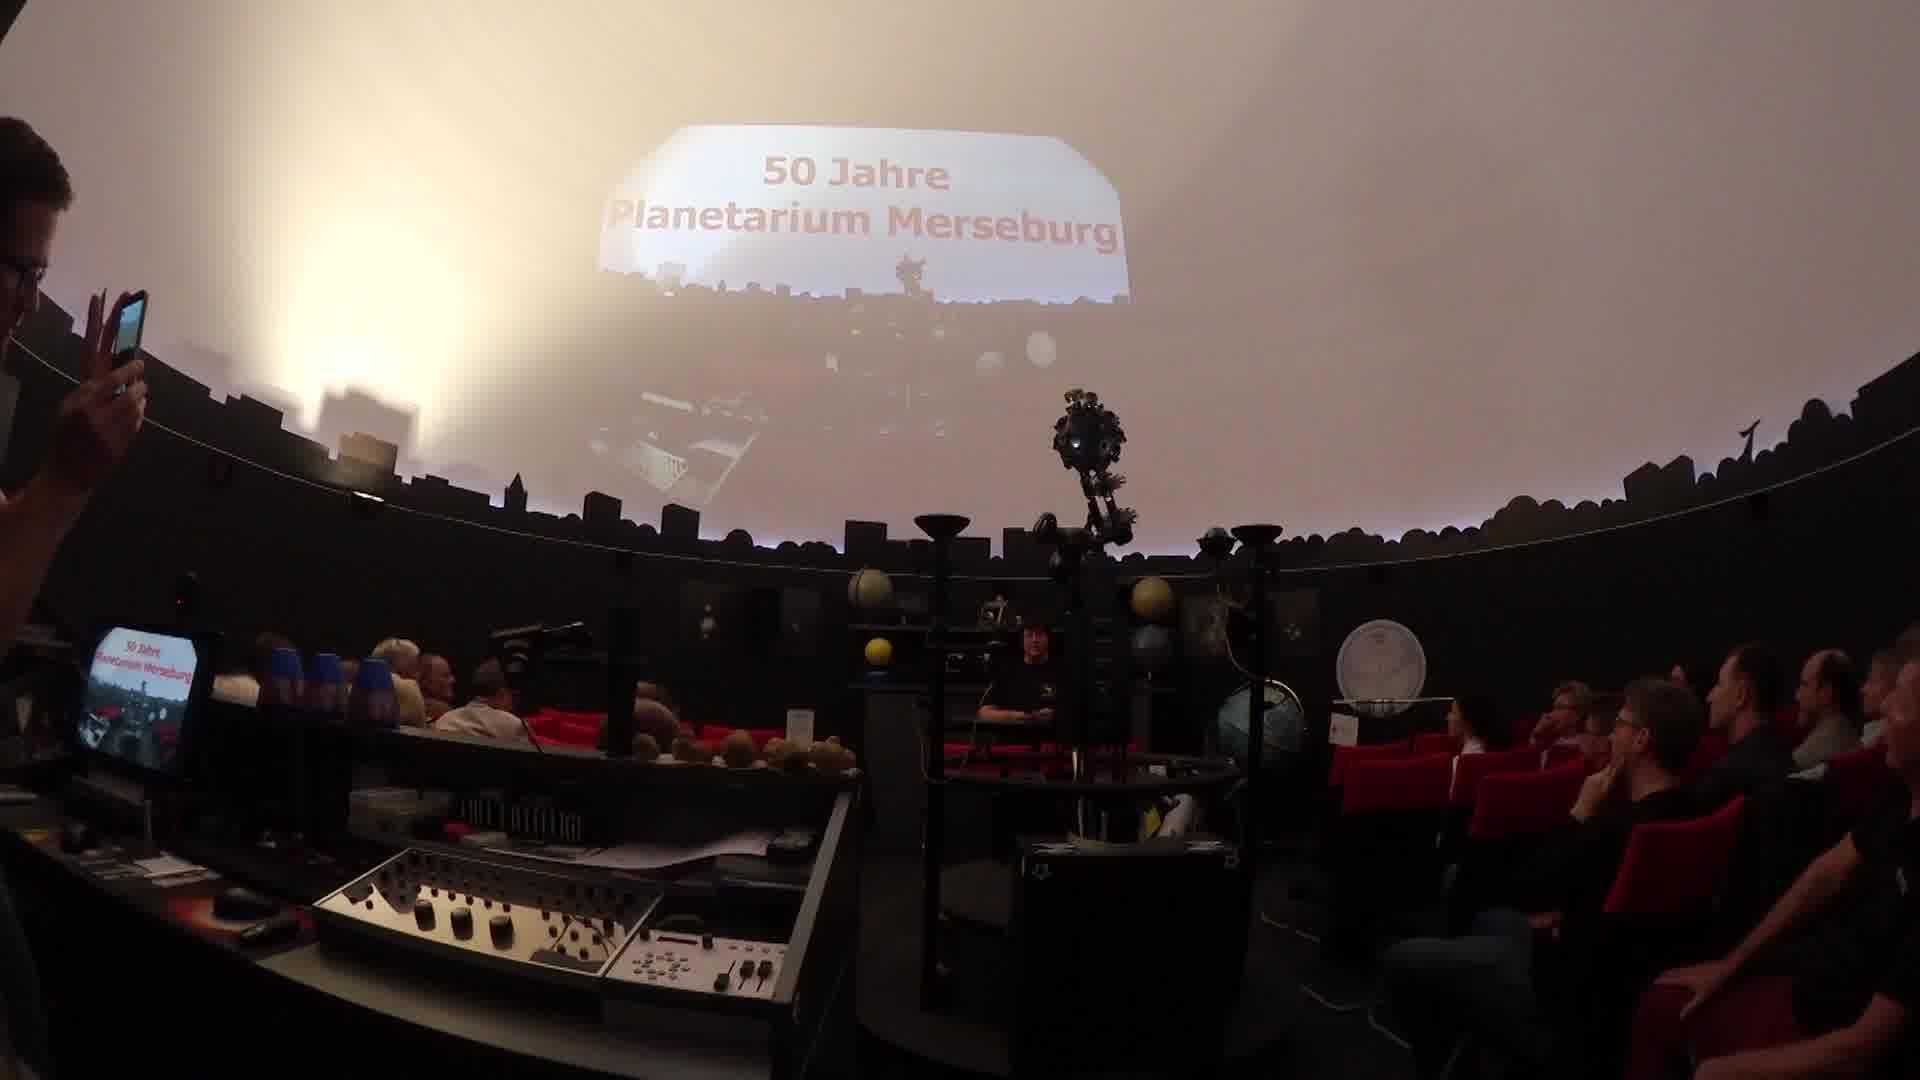 Planetarium Merseburg – 50-jähriges Jubiläum Fachkonferenz